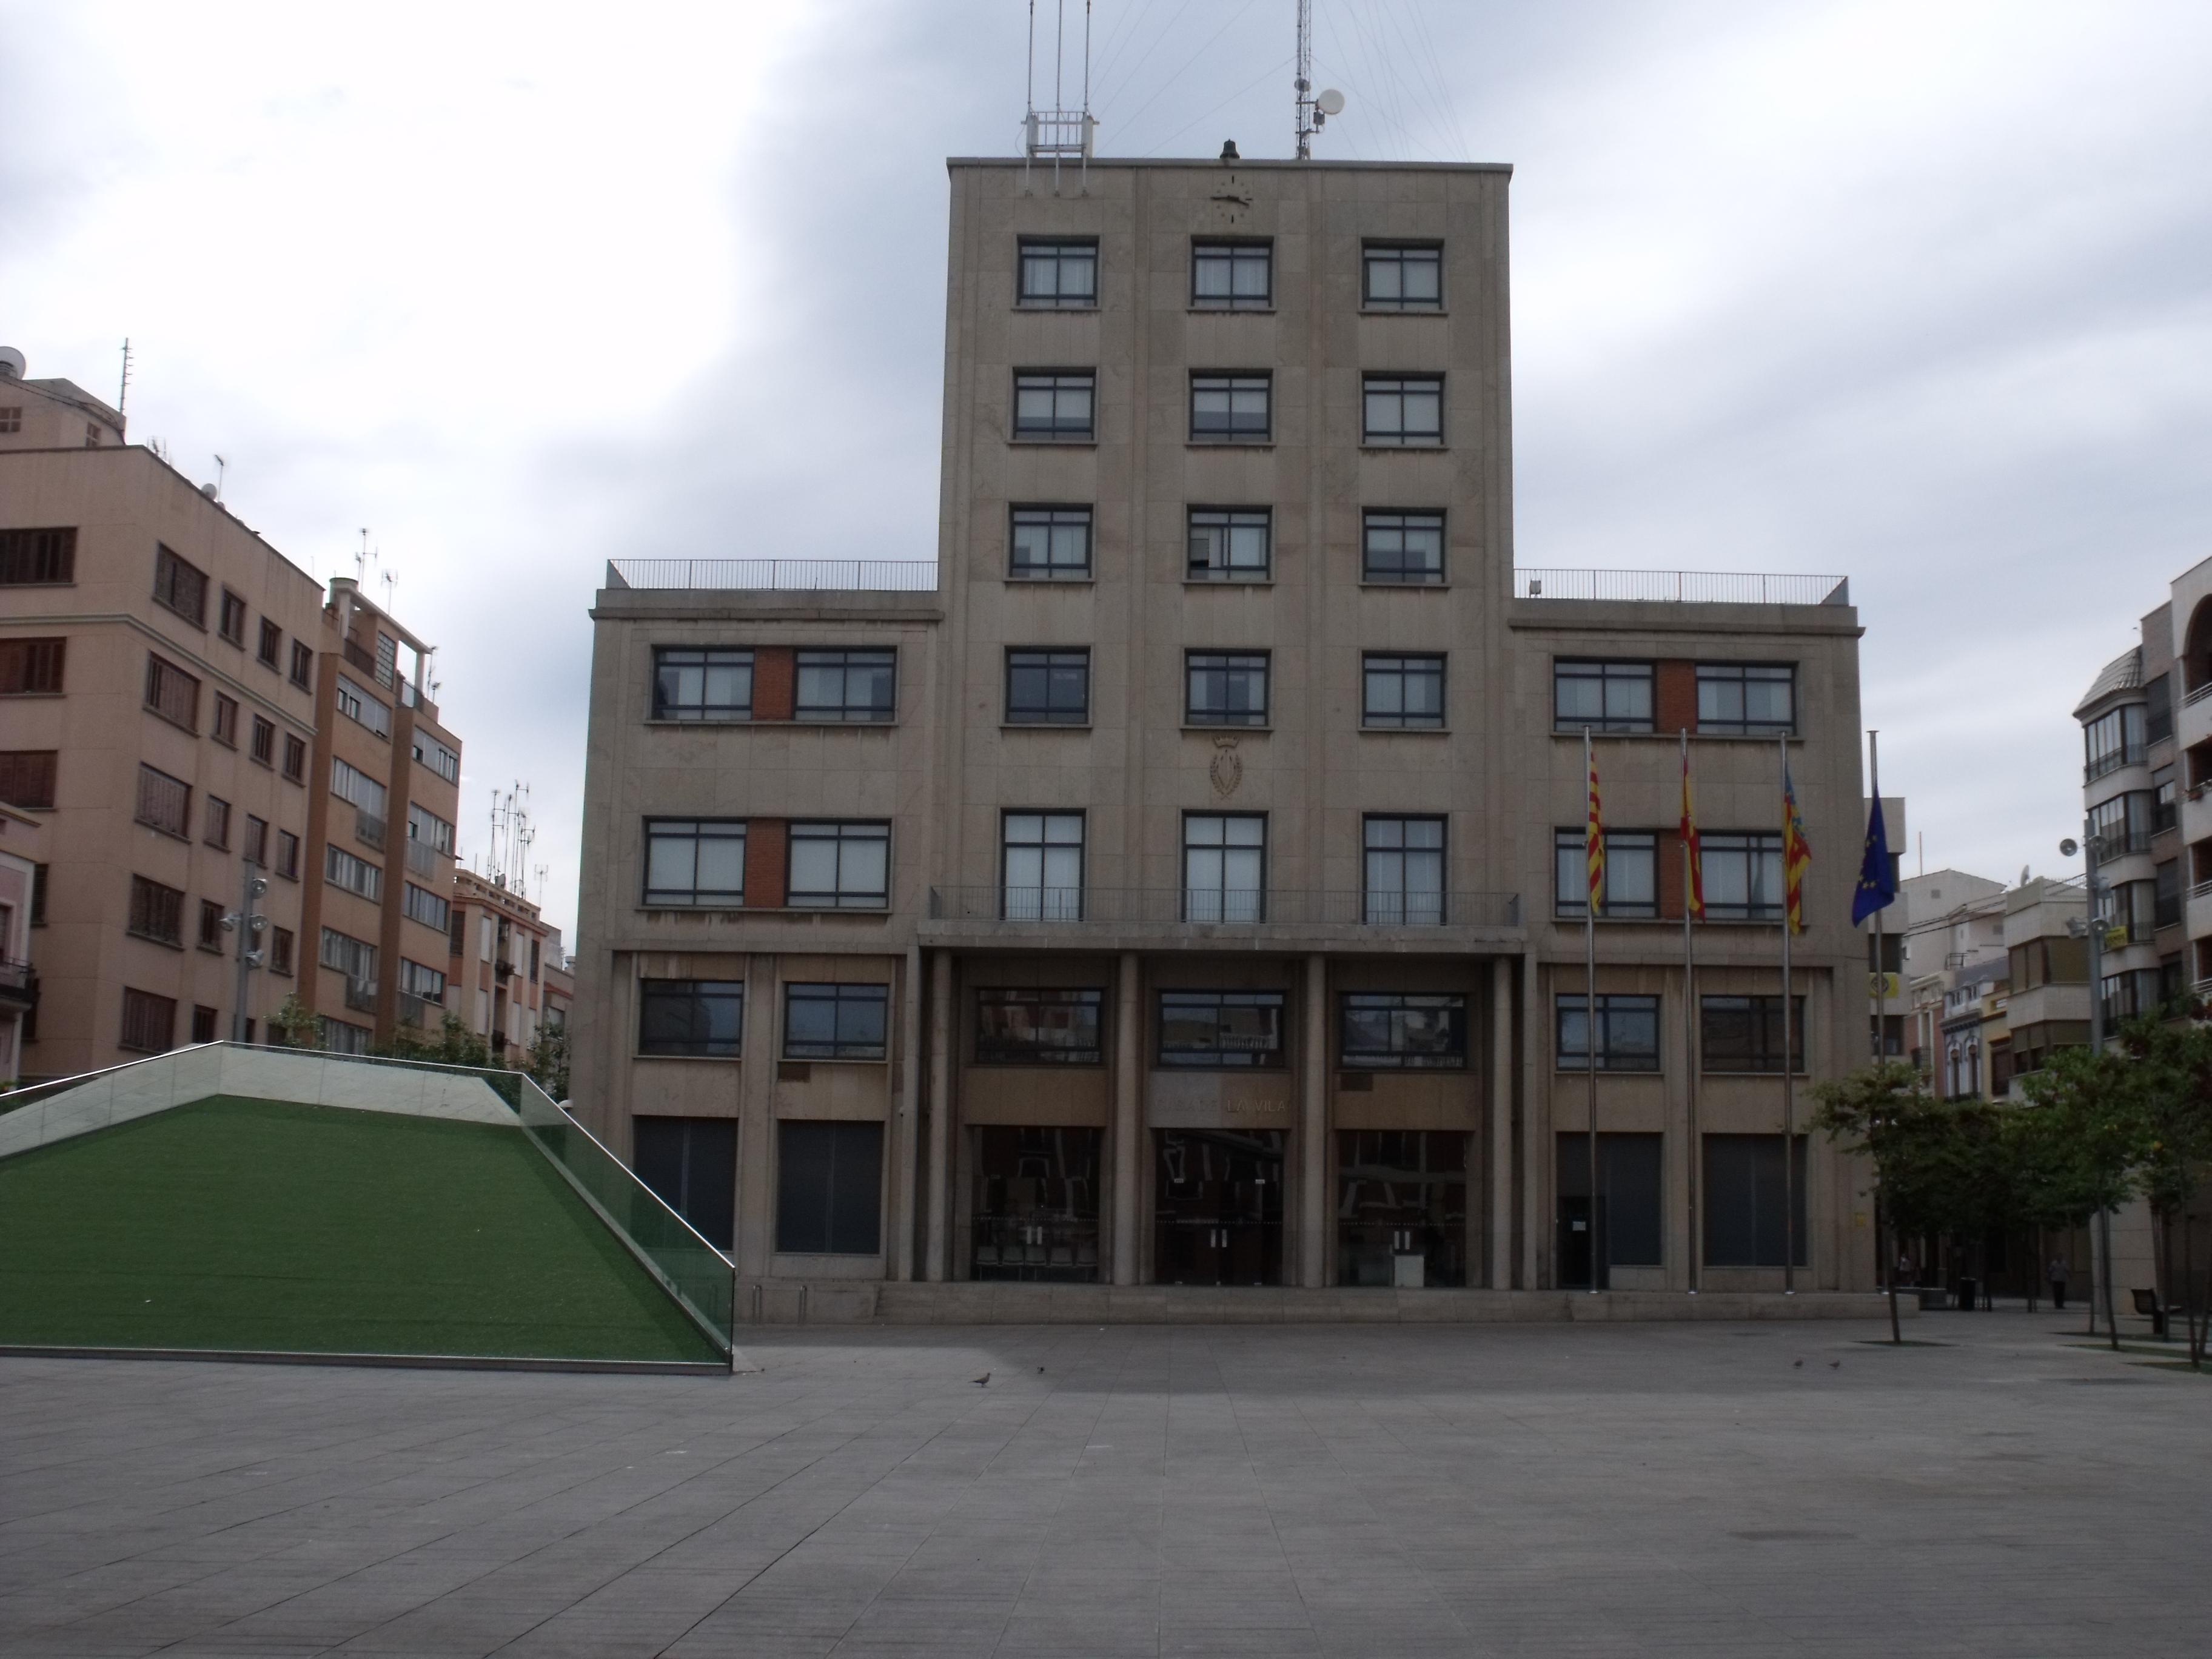 http://upload.wikimedia.org/wikipedia/commons/6/65/Ajuntament_de_Vila-real_alpha.JPG